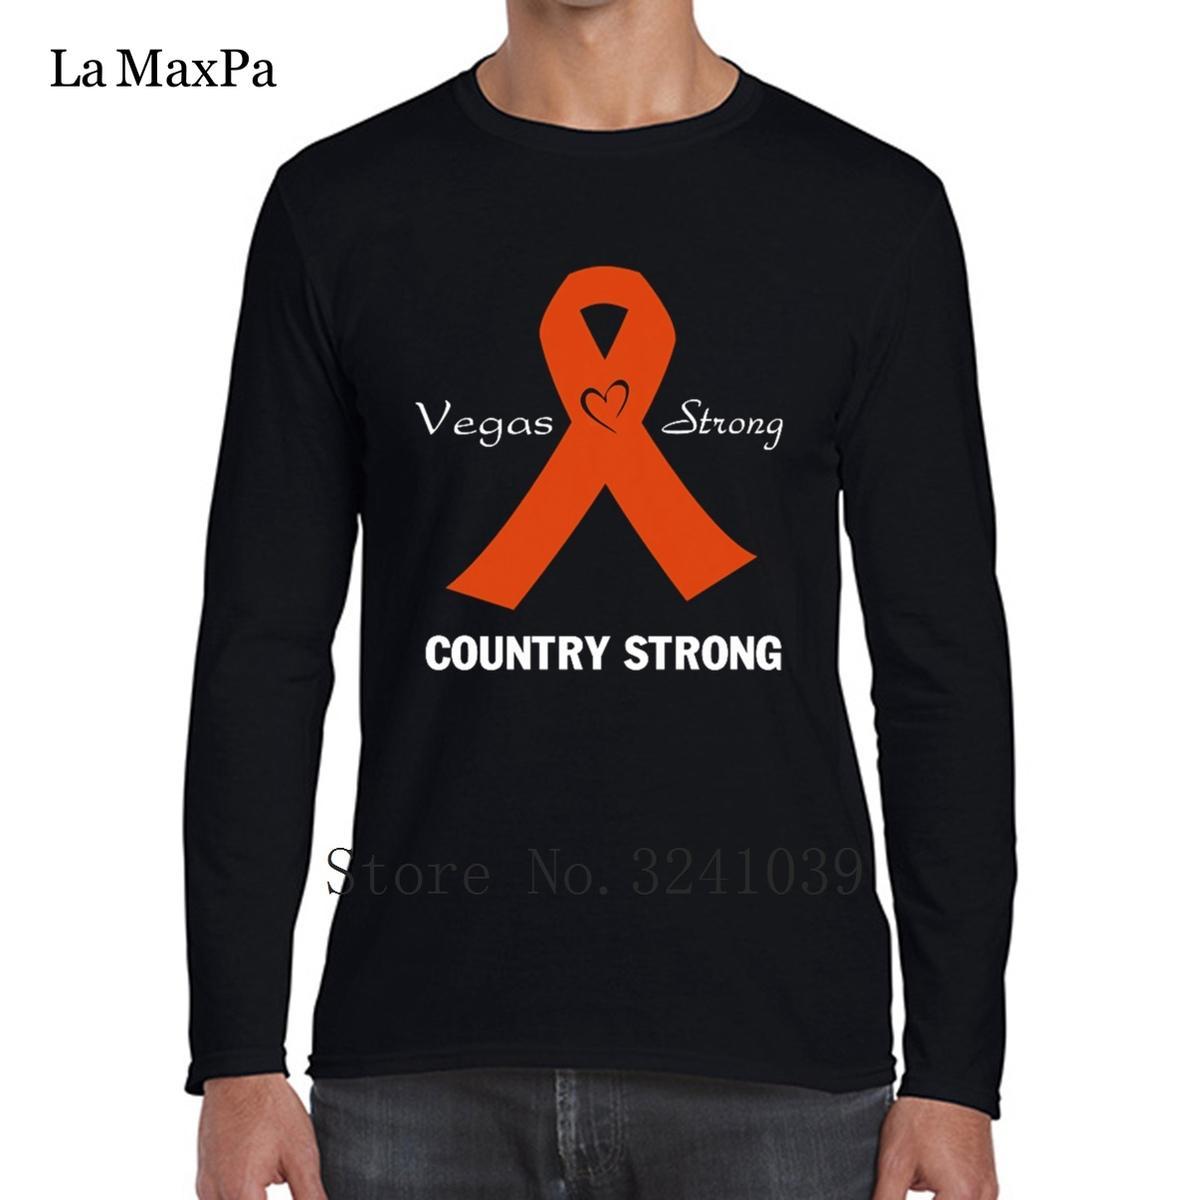 La Maxpa Design Your Own Crazy Tee Shirt Hombres Las Vegas Strong camiseta para hombre invierno Crew Neck Streetwear Regular Tshirt